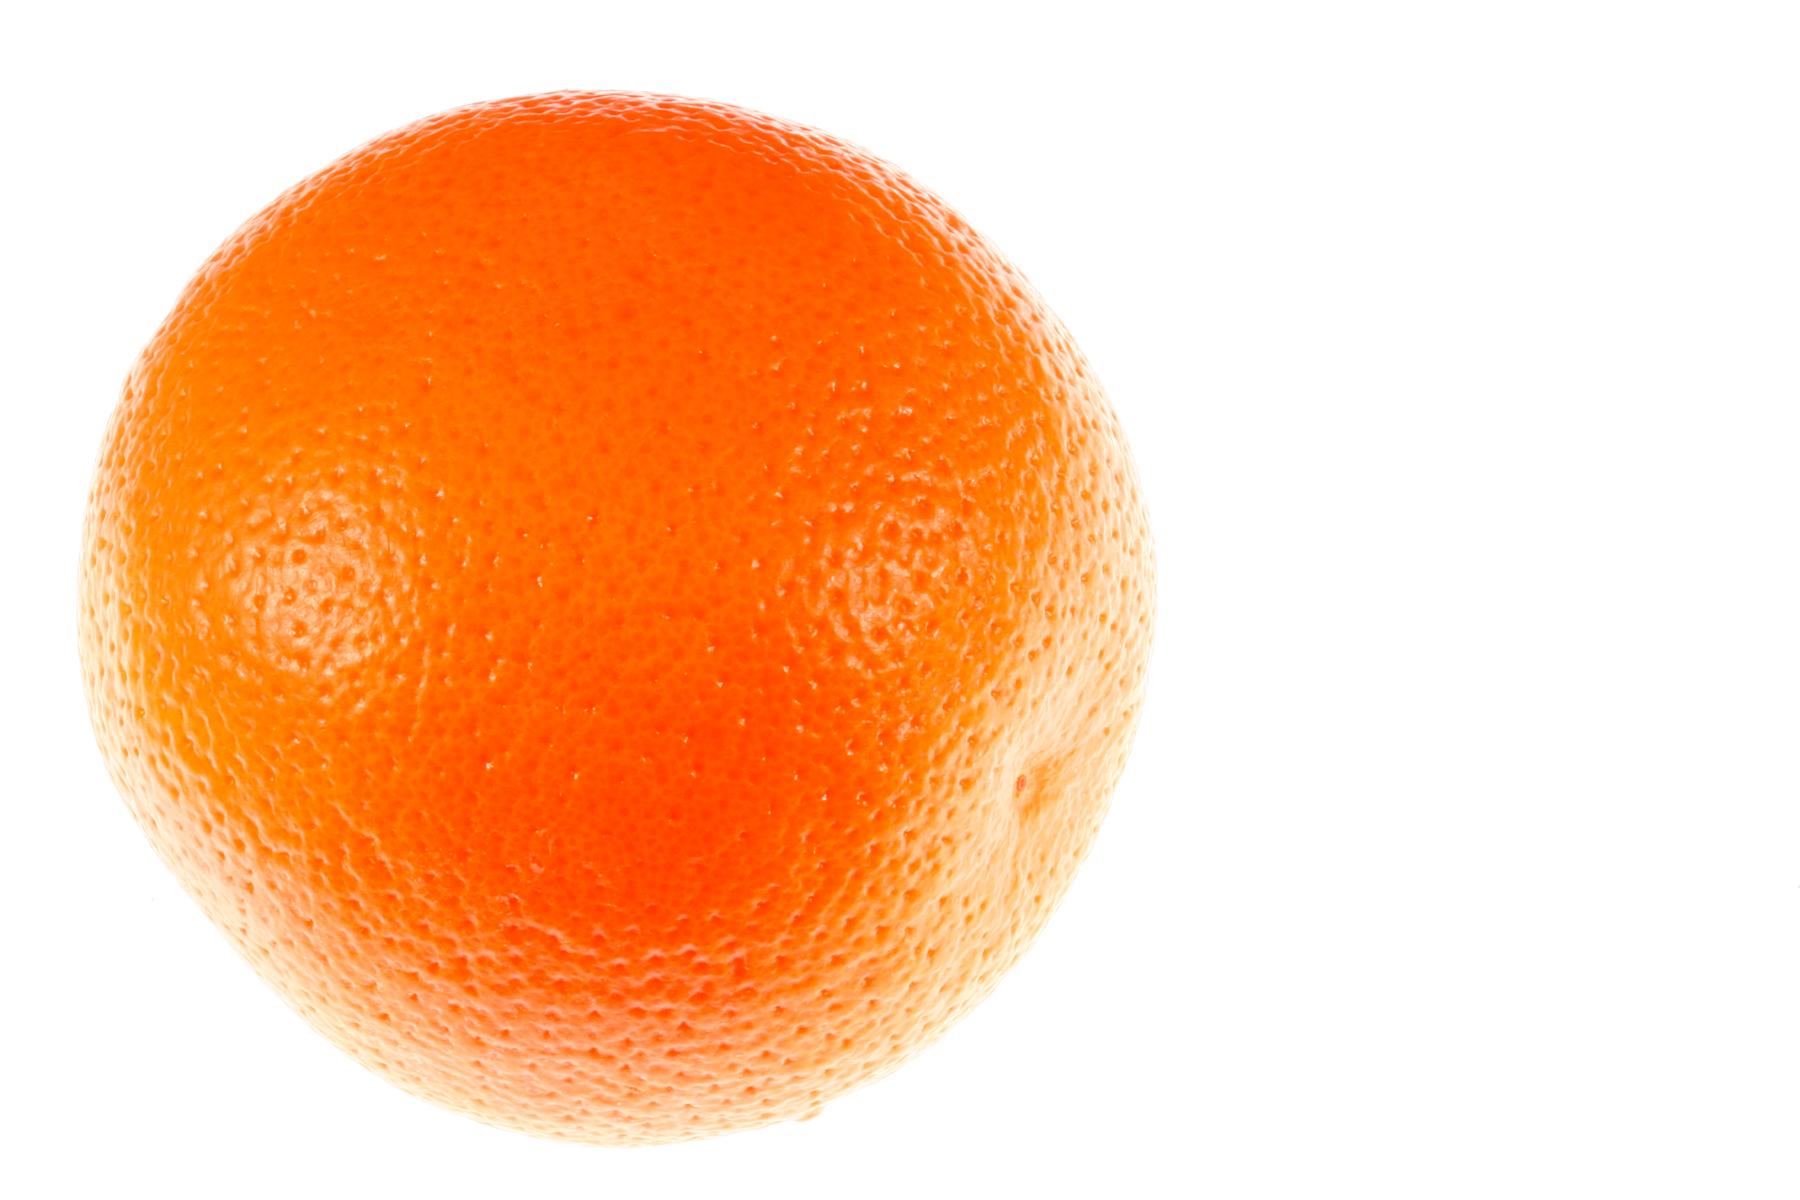 Vibrant Orange, Bitter, Simple, Orange, Organic, HQ Photo